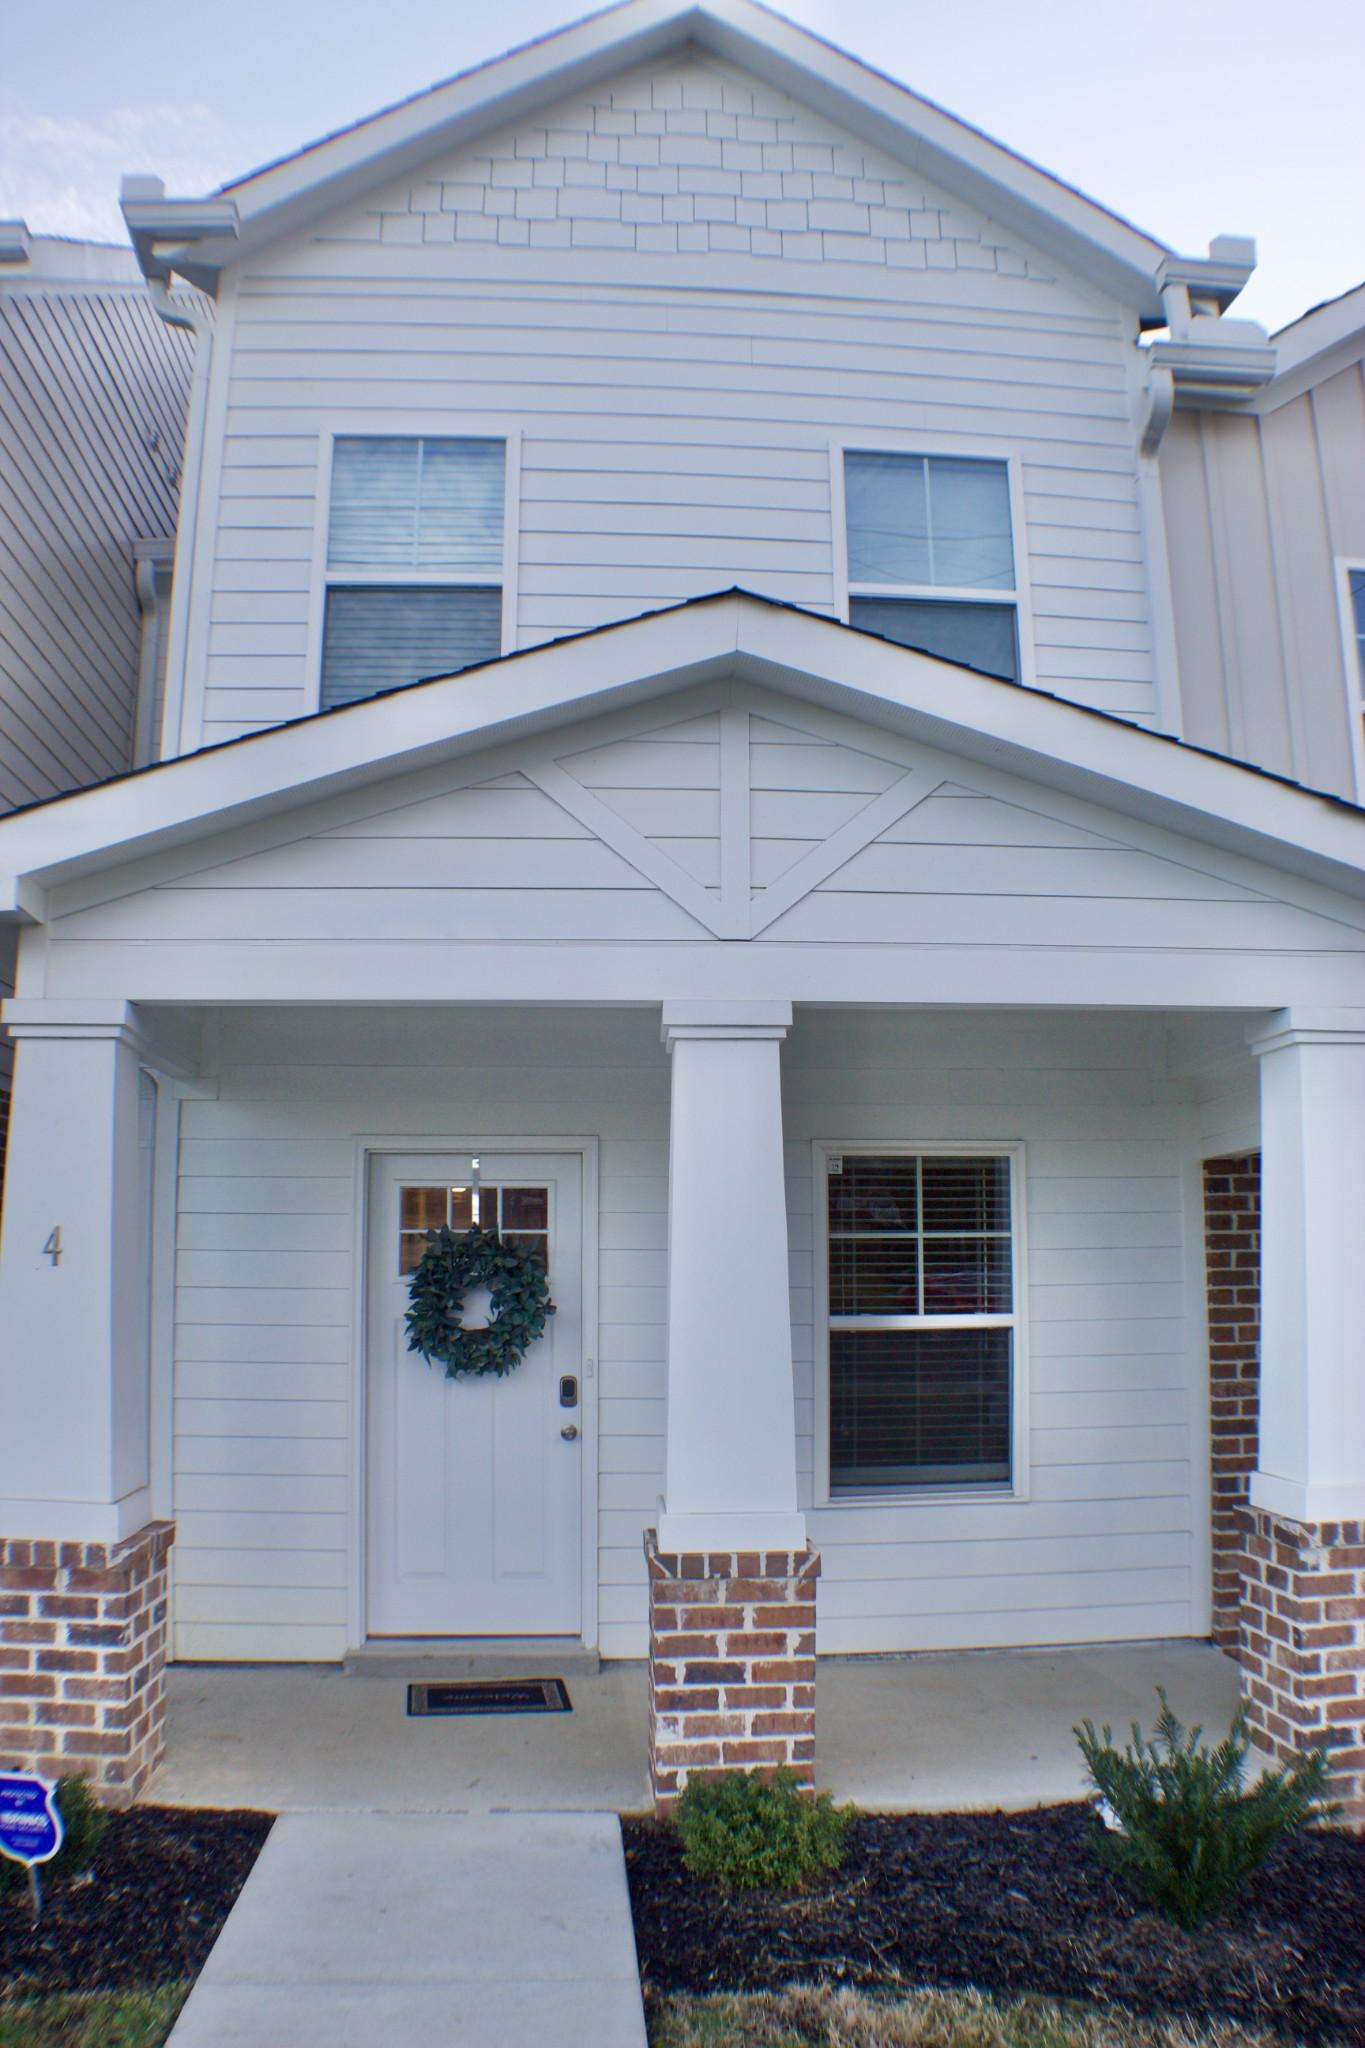 4325 Ashland City Hwy, Nashville, TN 37218 - Nashville, TN real estate listing